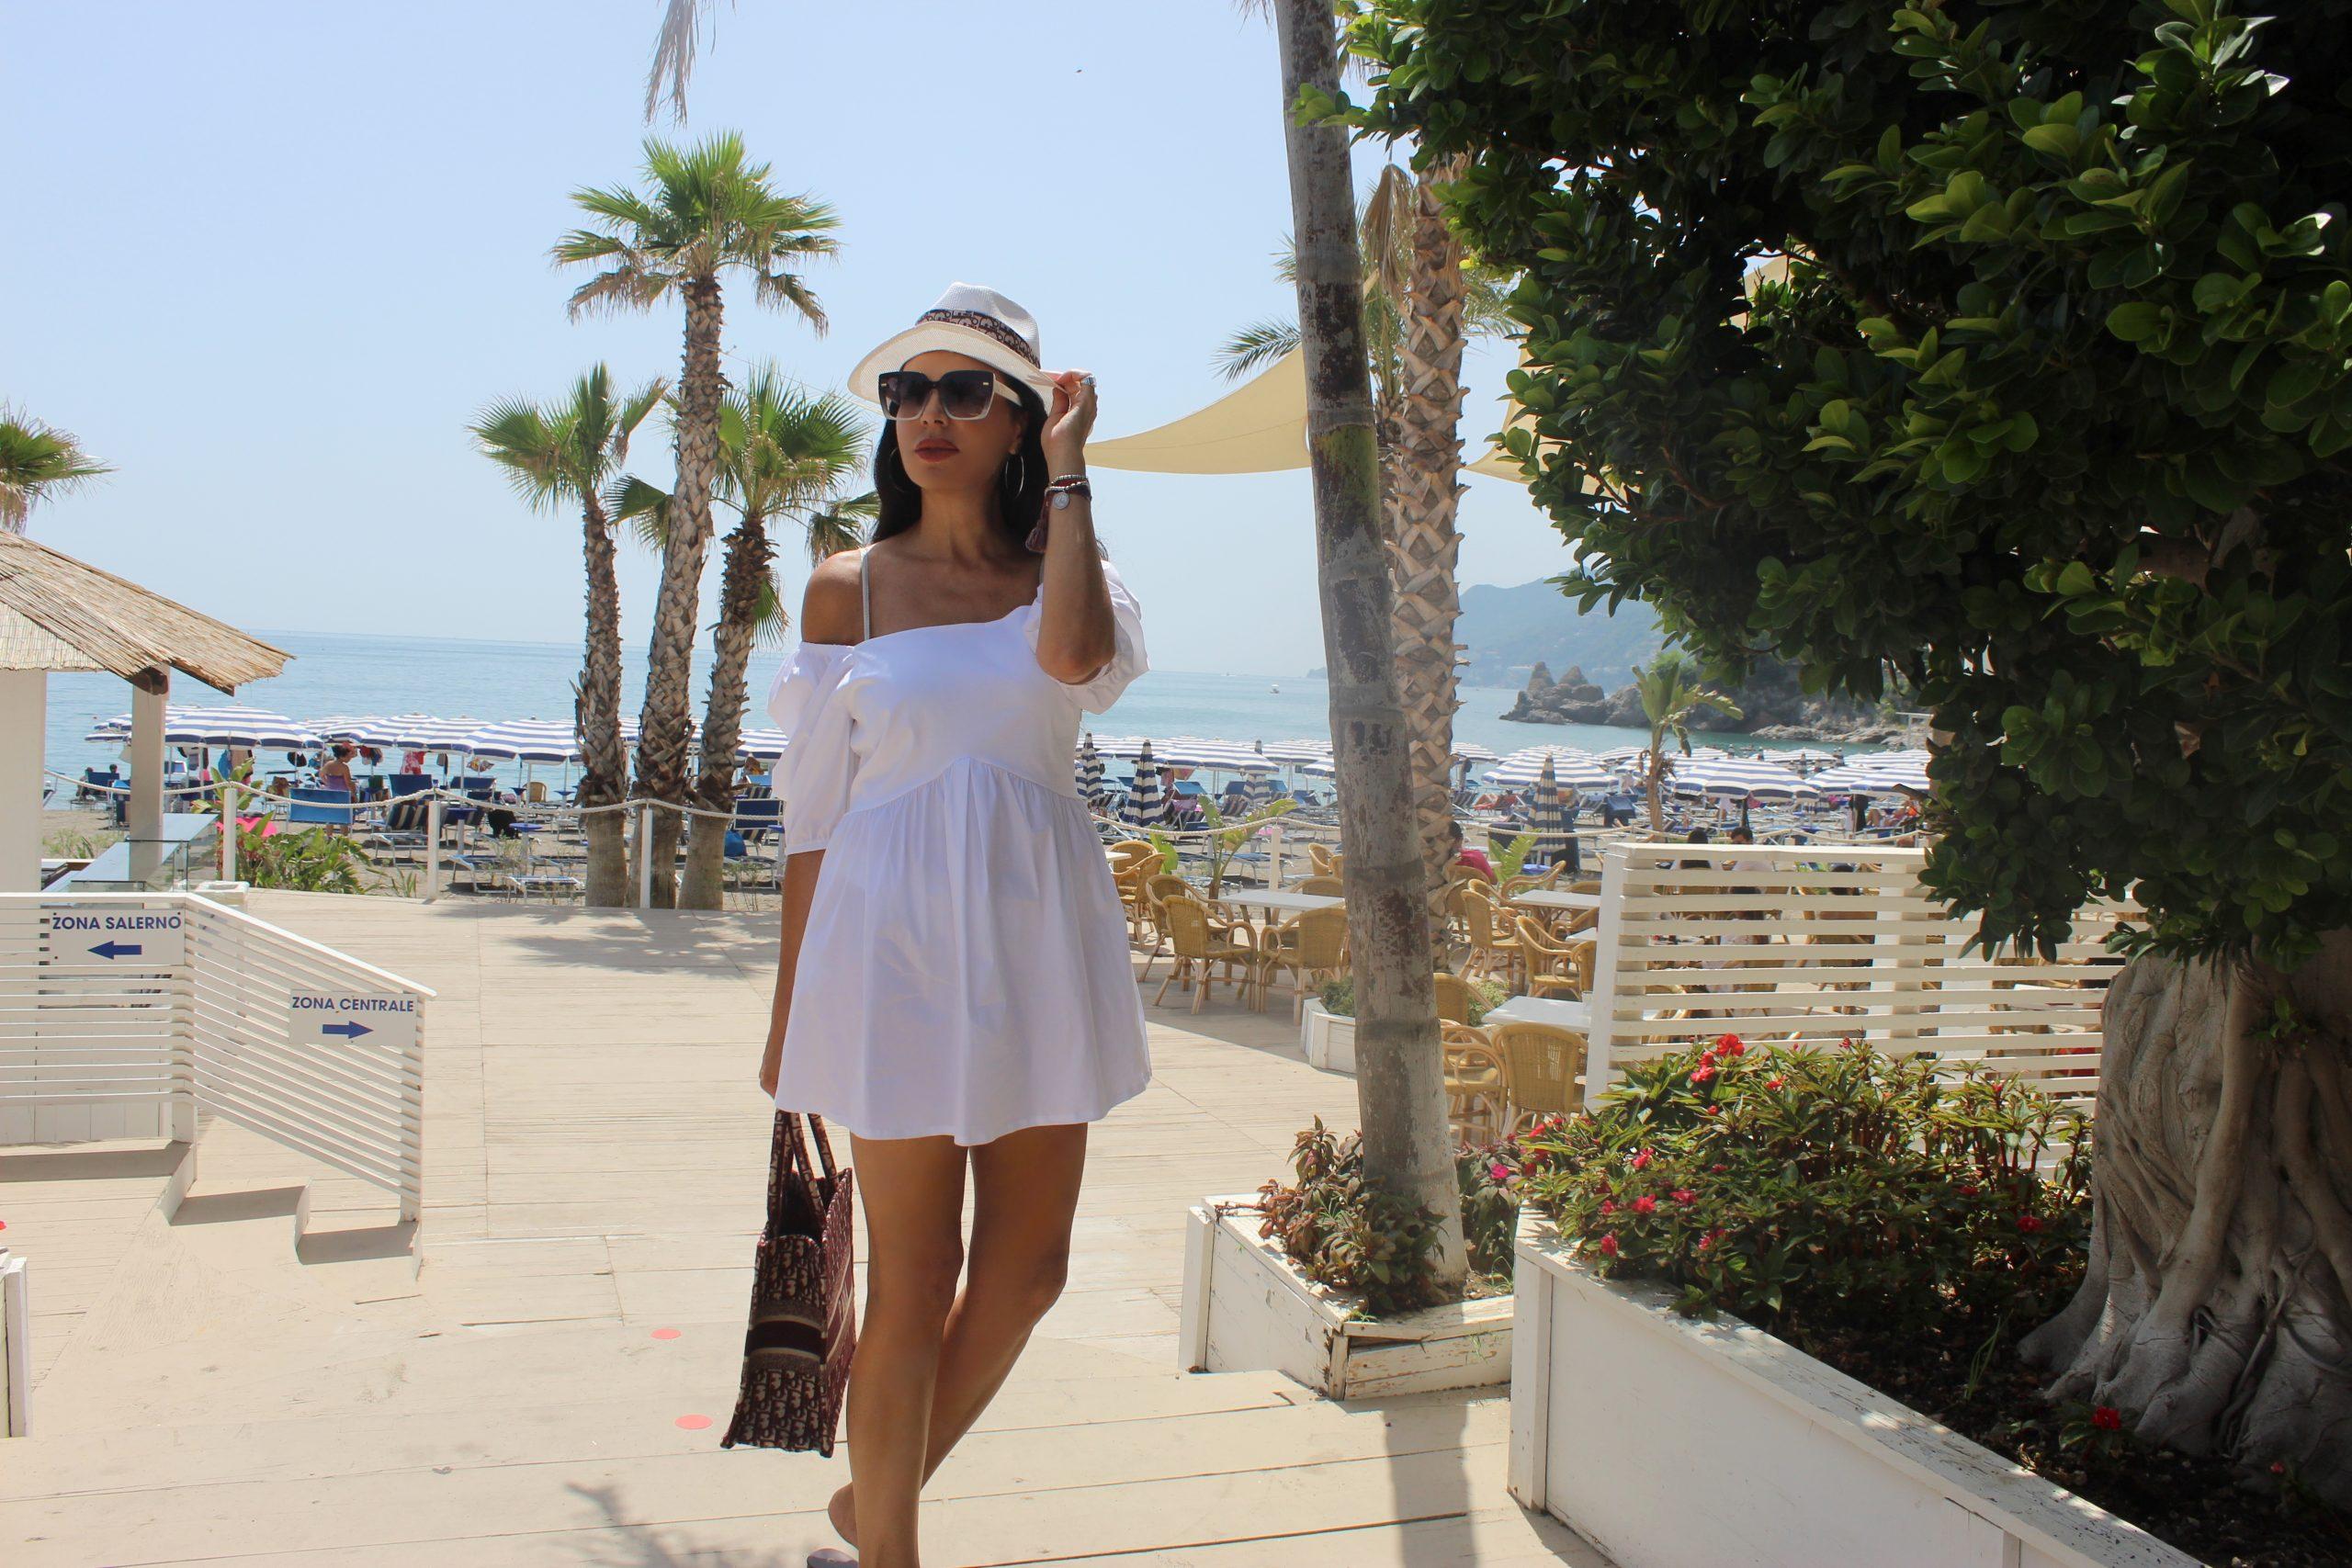 Italian Staycation Travel Tips Little White Dress Summertime Beachwear Paola Lauretano